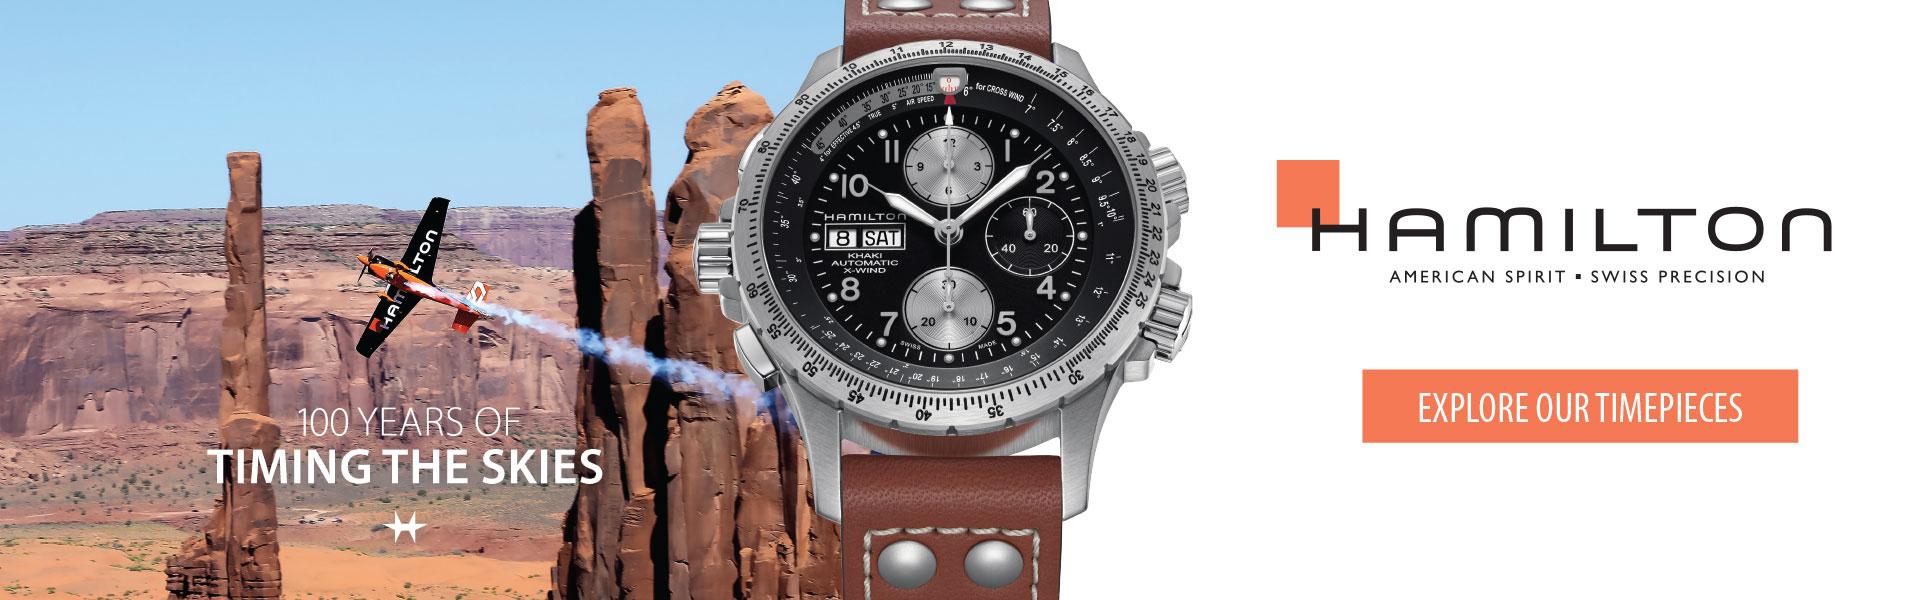 matheu_s-fine-watches_100-years_1920x600_header